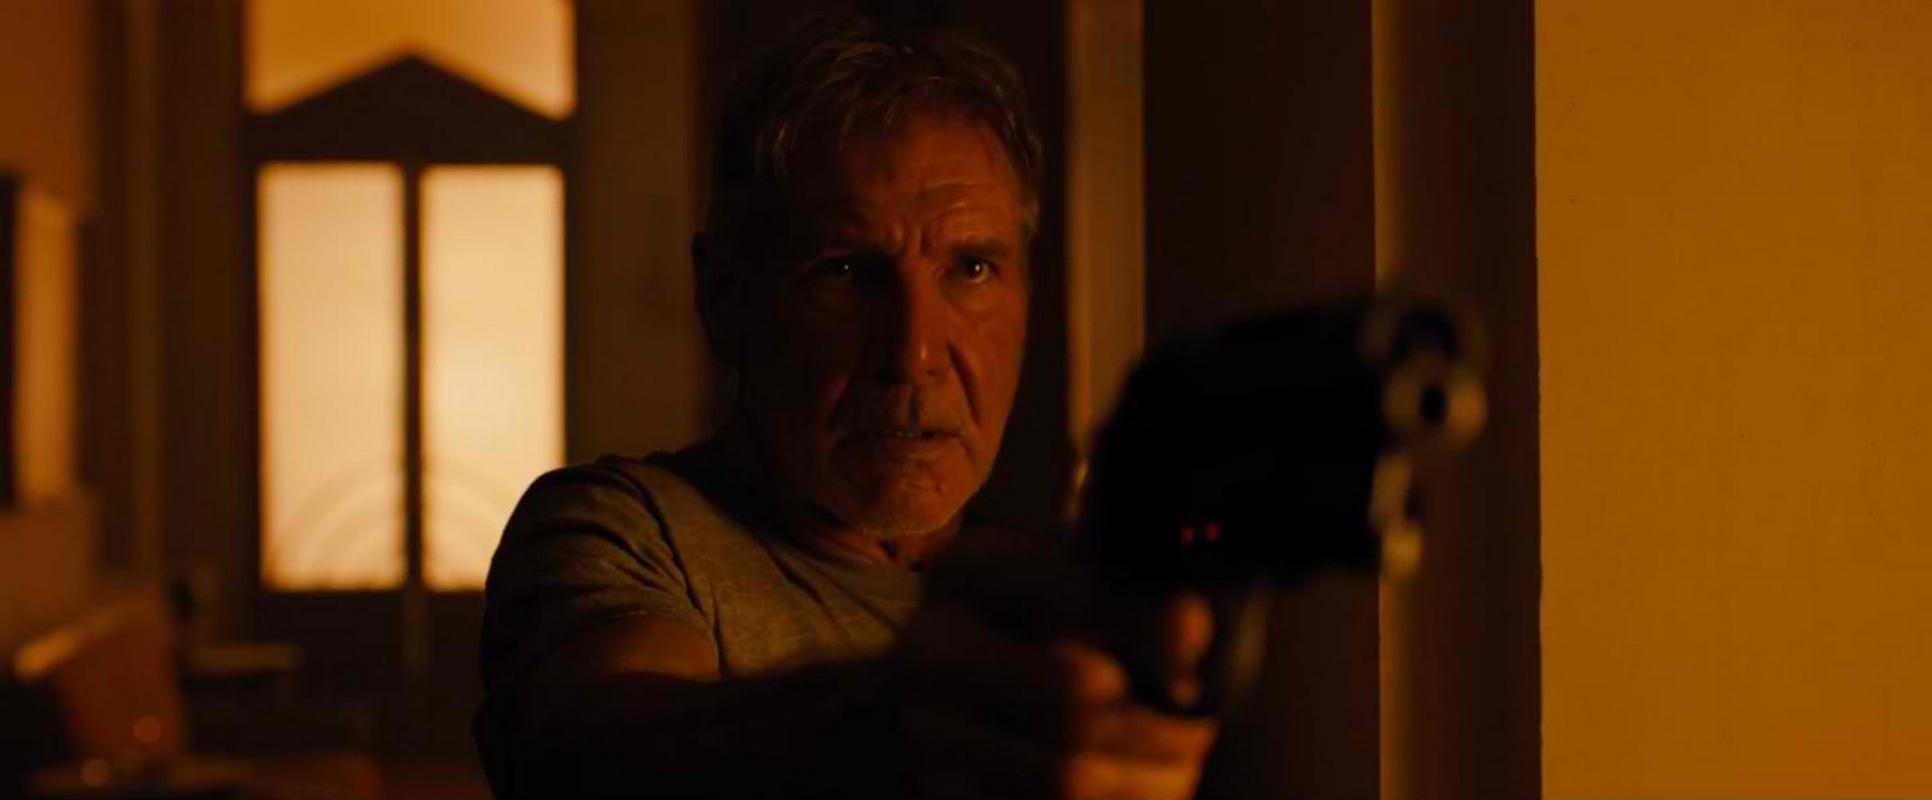 Blade Runner 2049 Announcement Trailer Arrives Online ... - photo#43